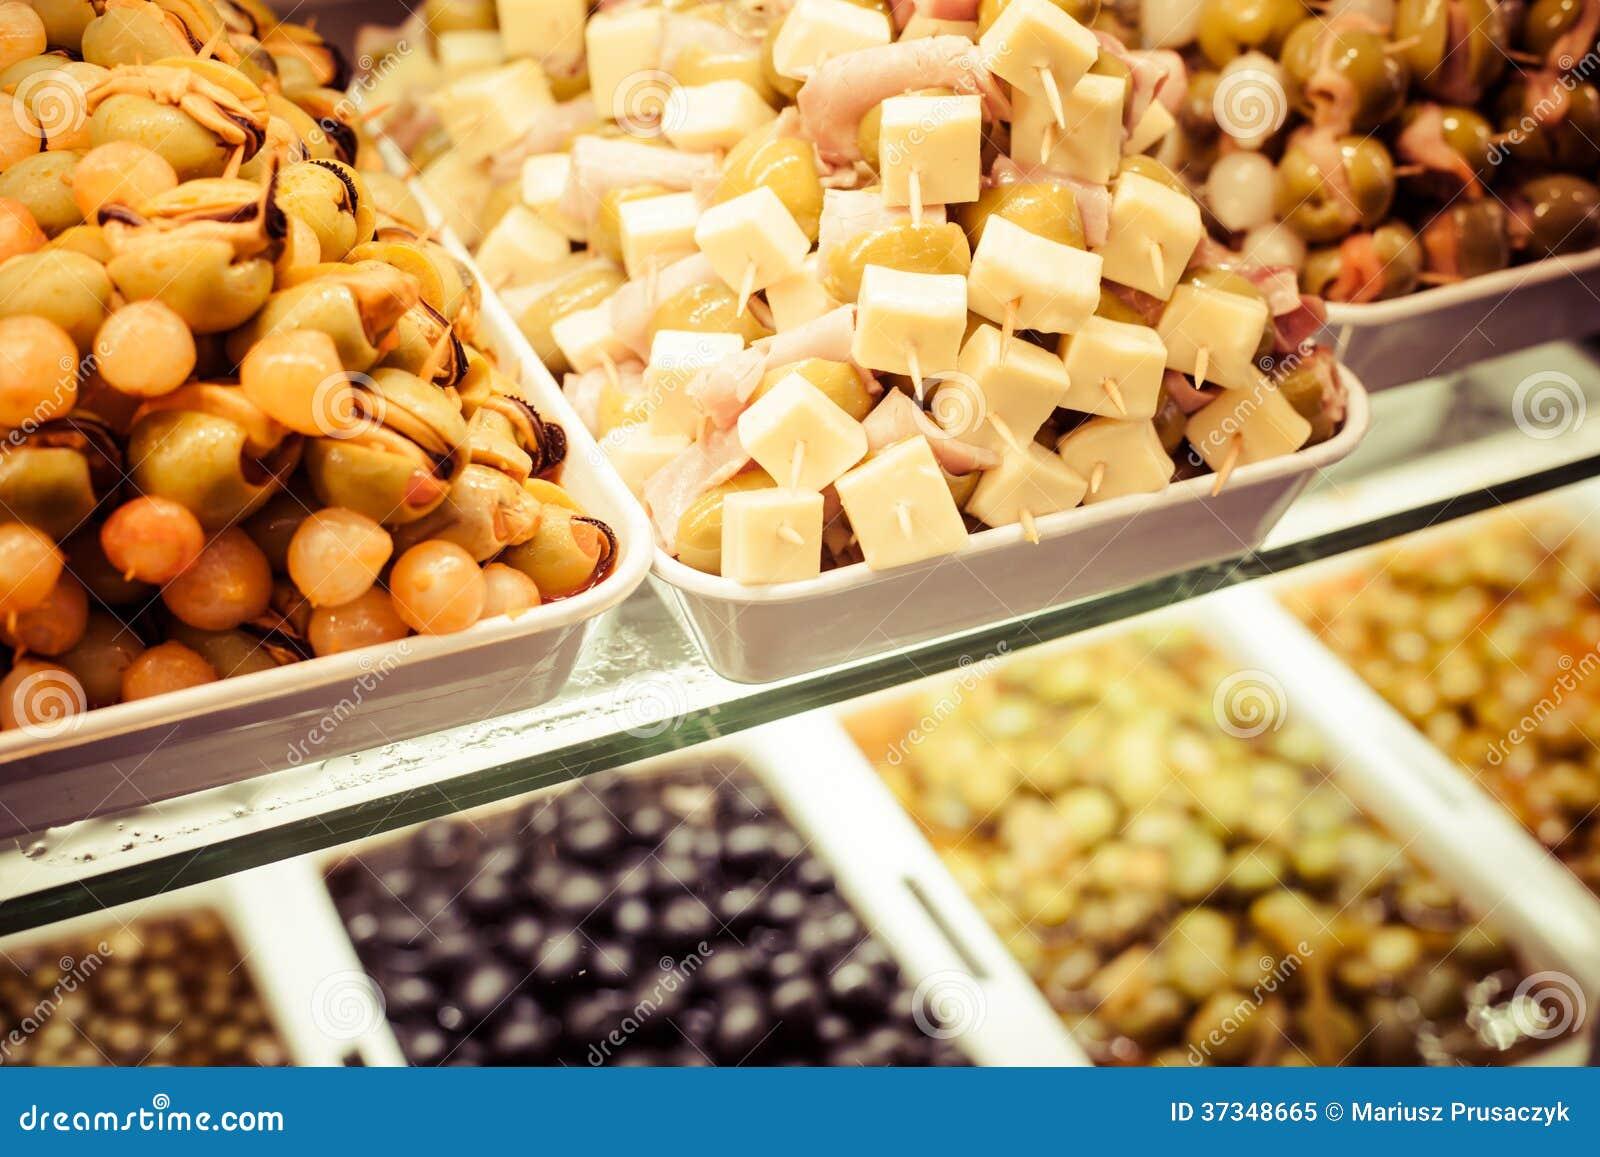 Mercado español típico de la comida.